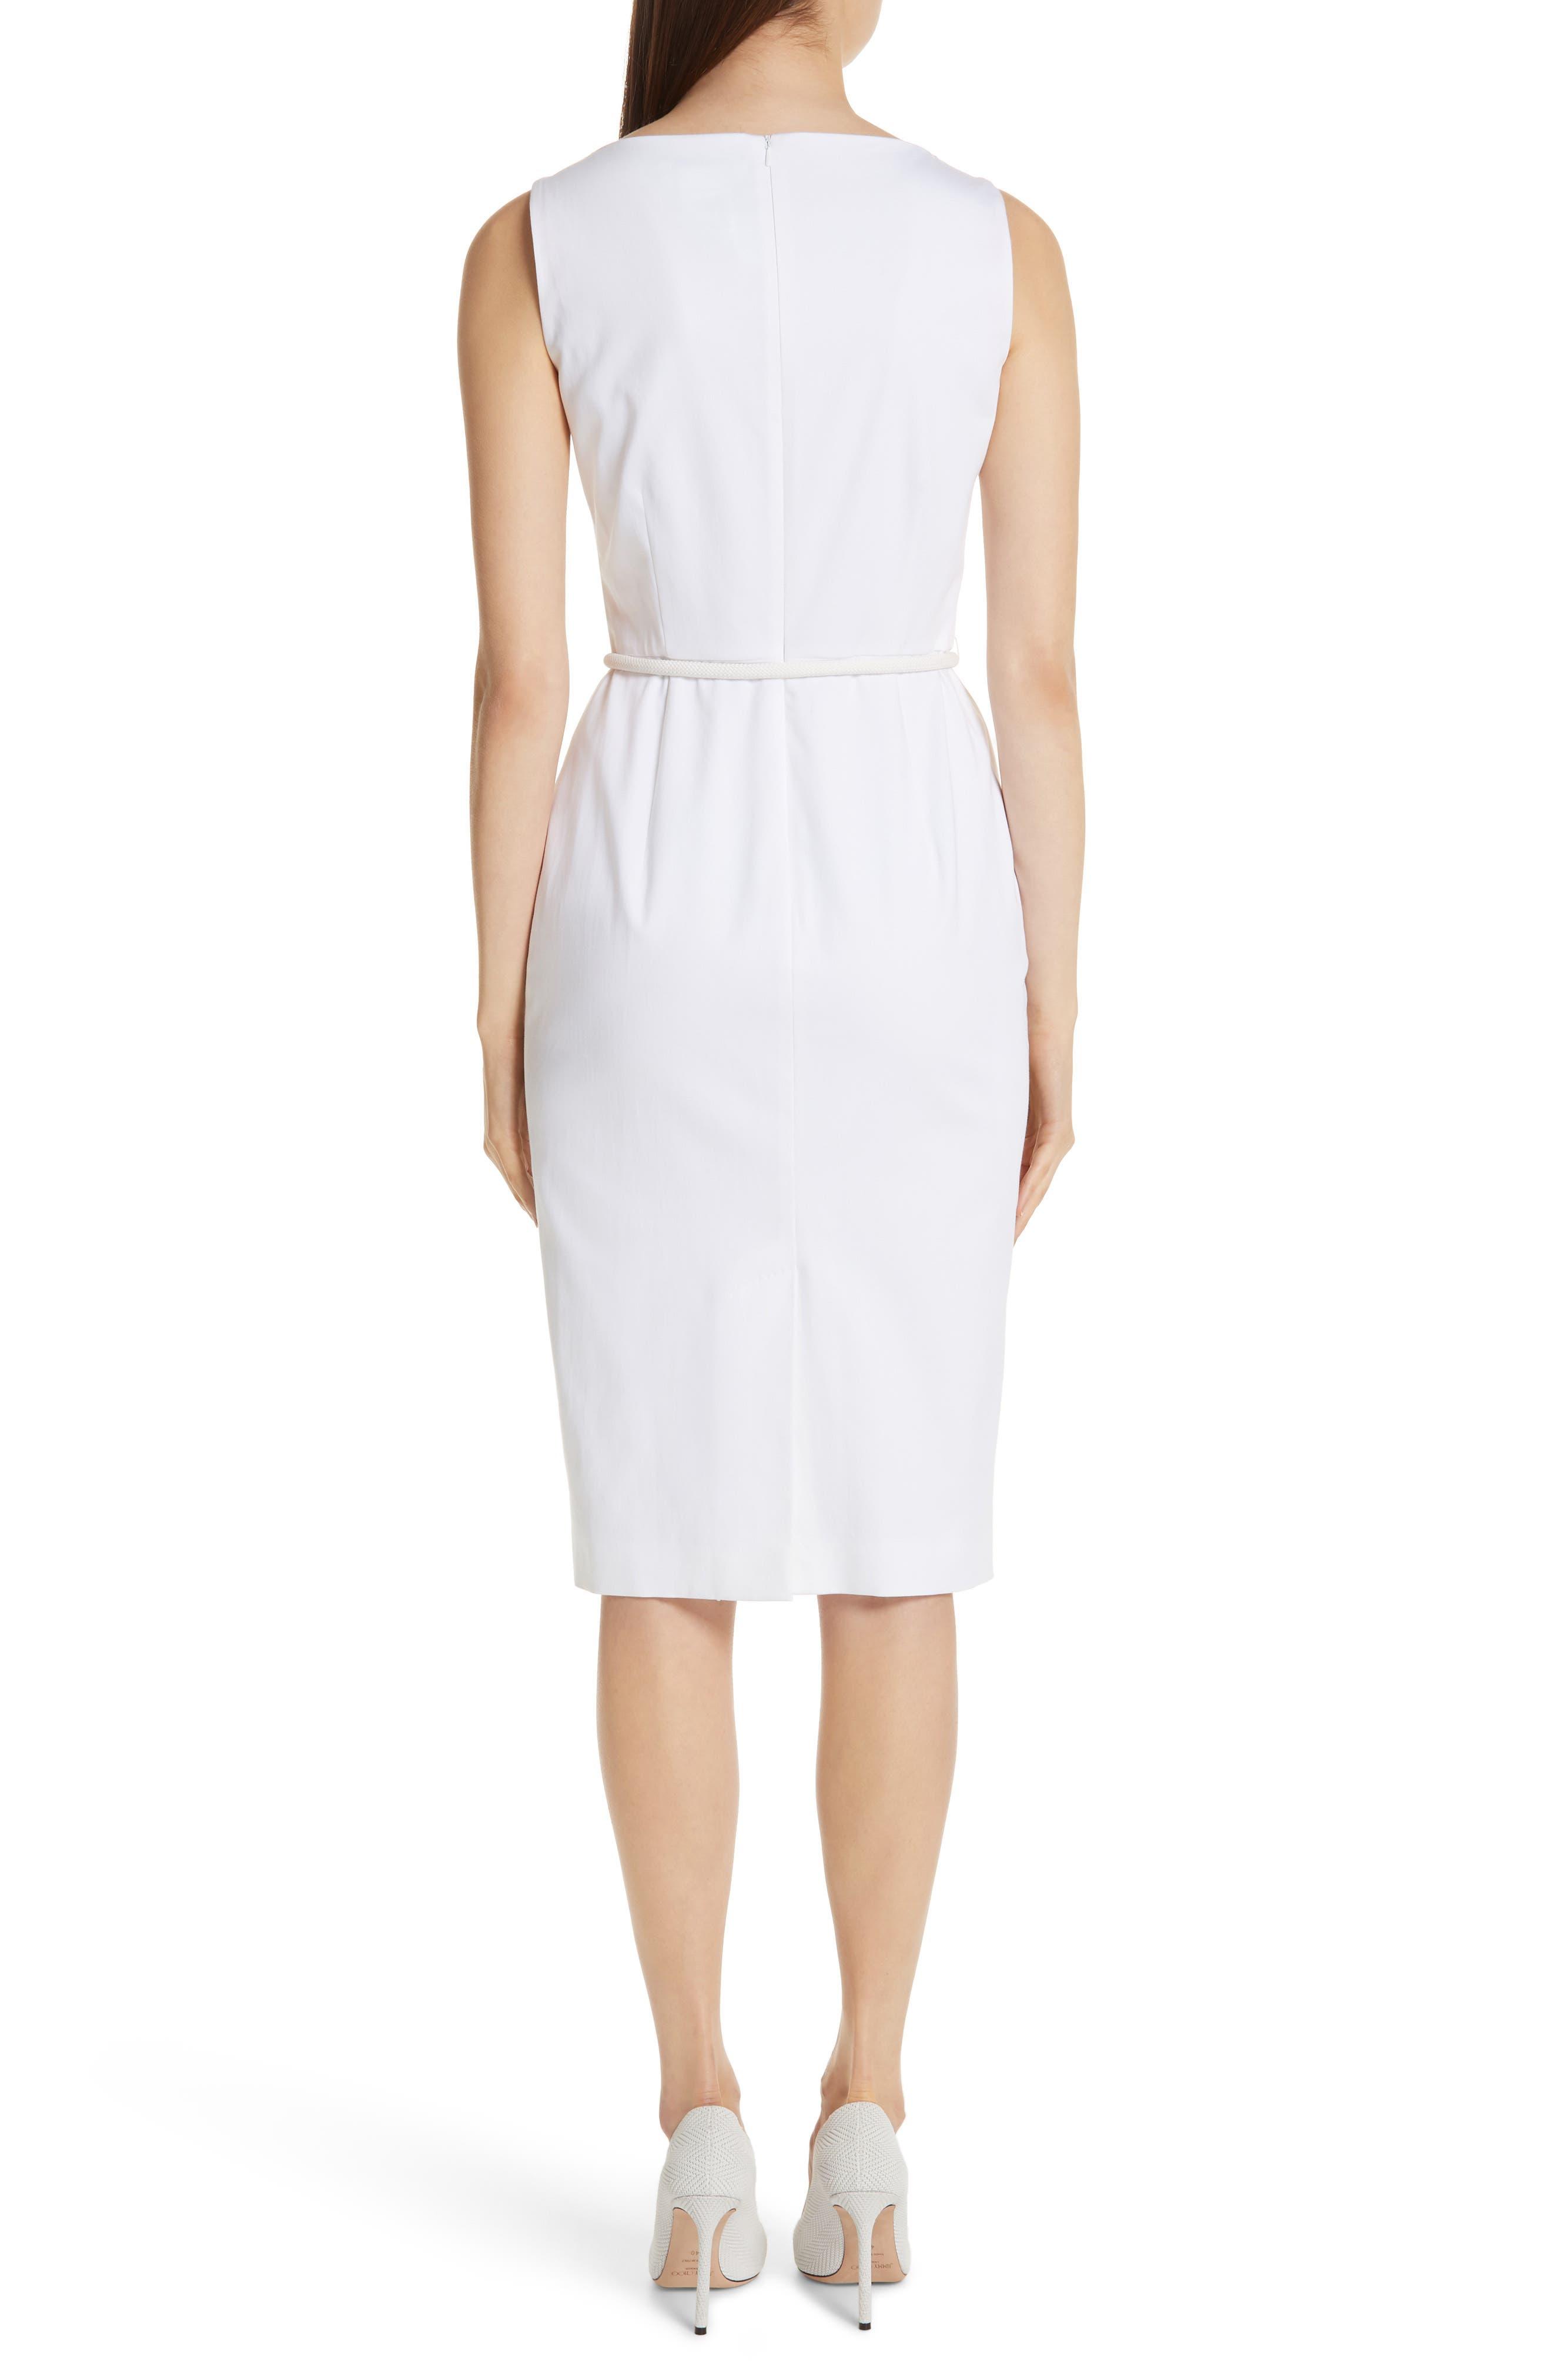 MAX MARA, Cordoba Sheath Dress, Alternate thumbnail 2, color, OPTICAL WHITE